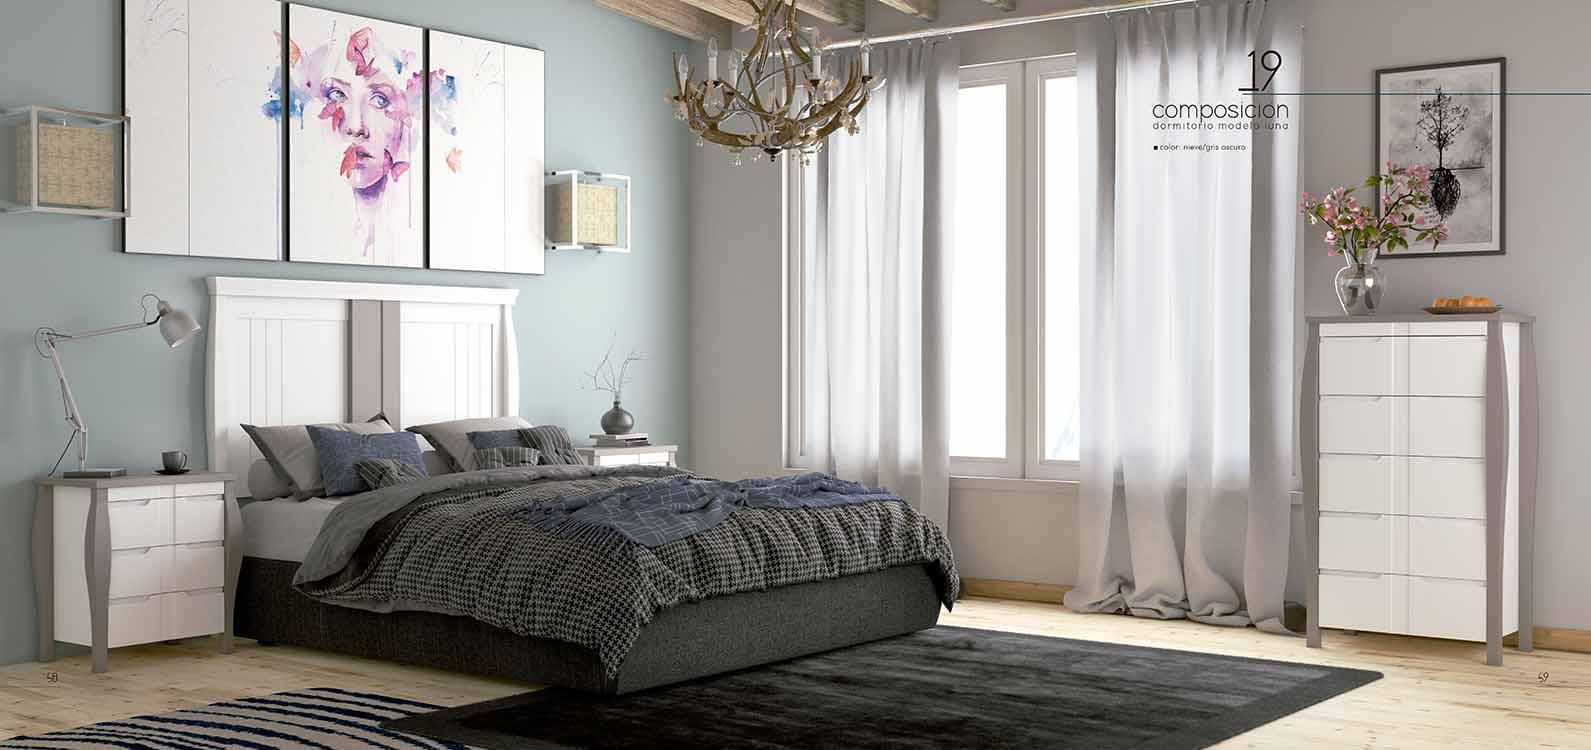 http://www.munozmuebles.net/nueva/catalogo/dormitorios-clasicos.html - Encontrar  muebles fucsias